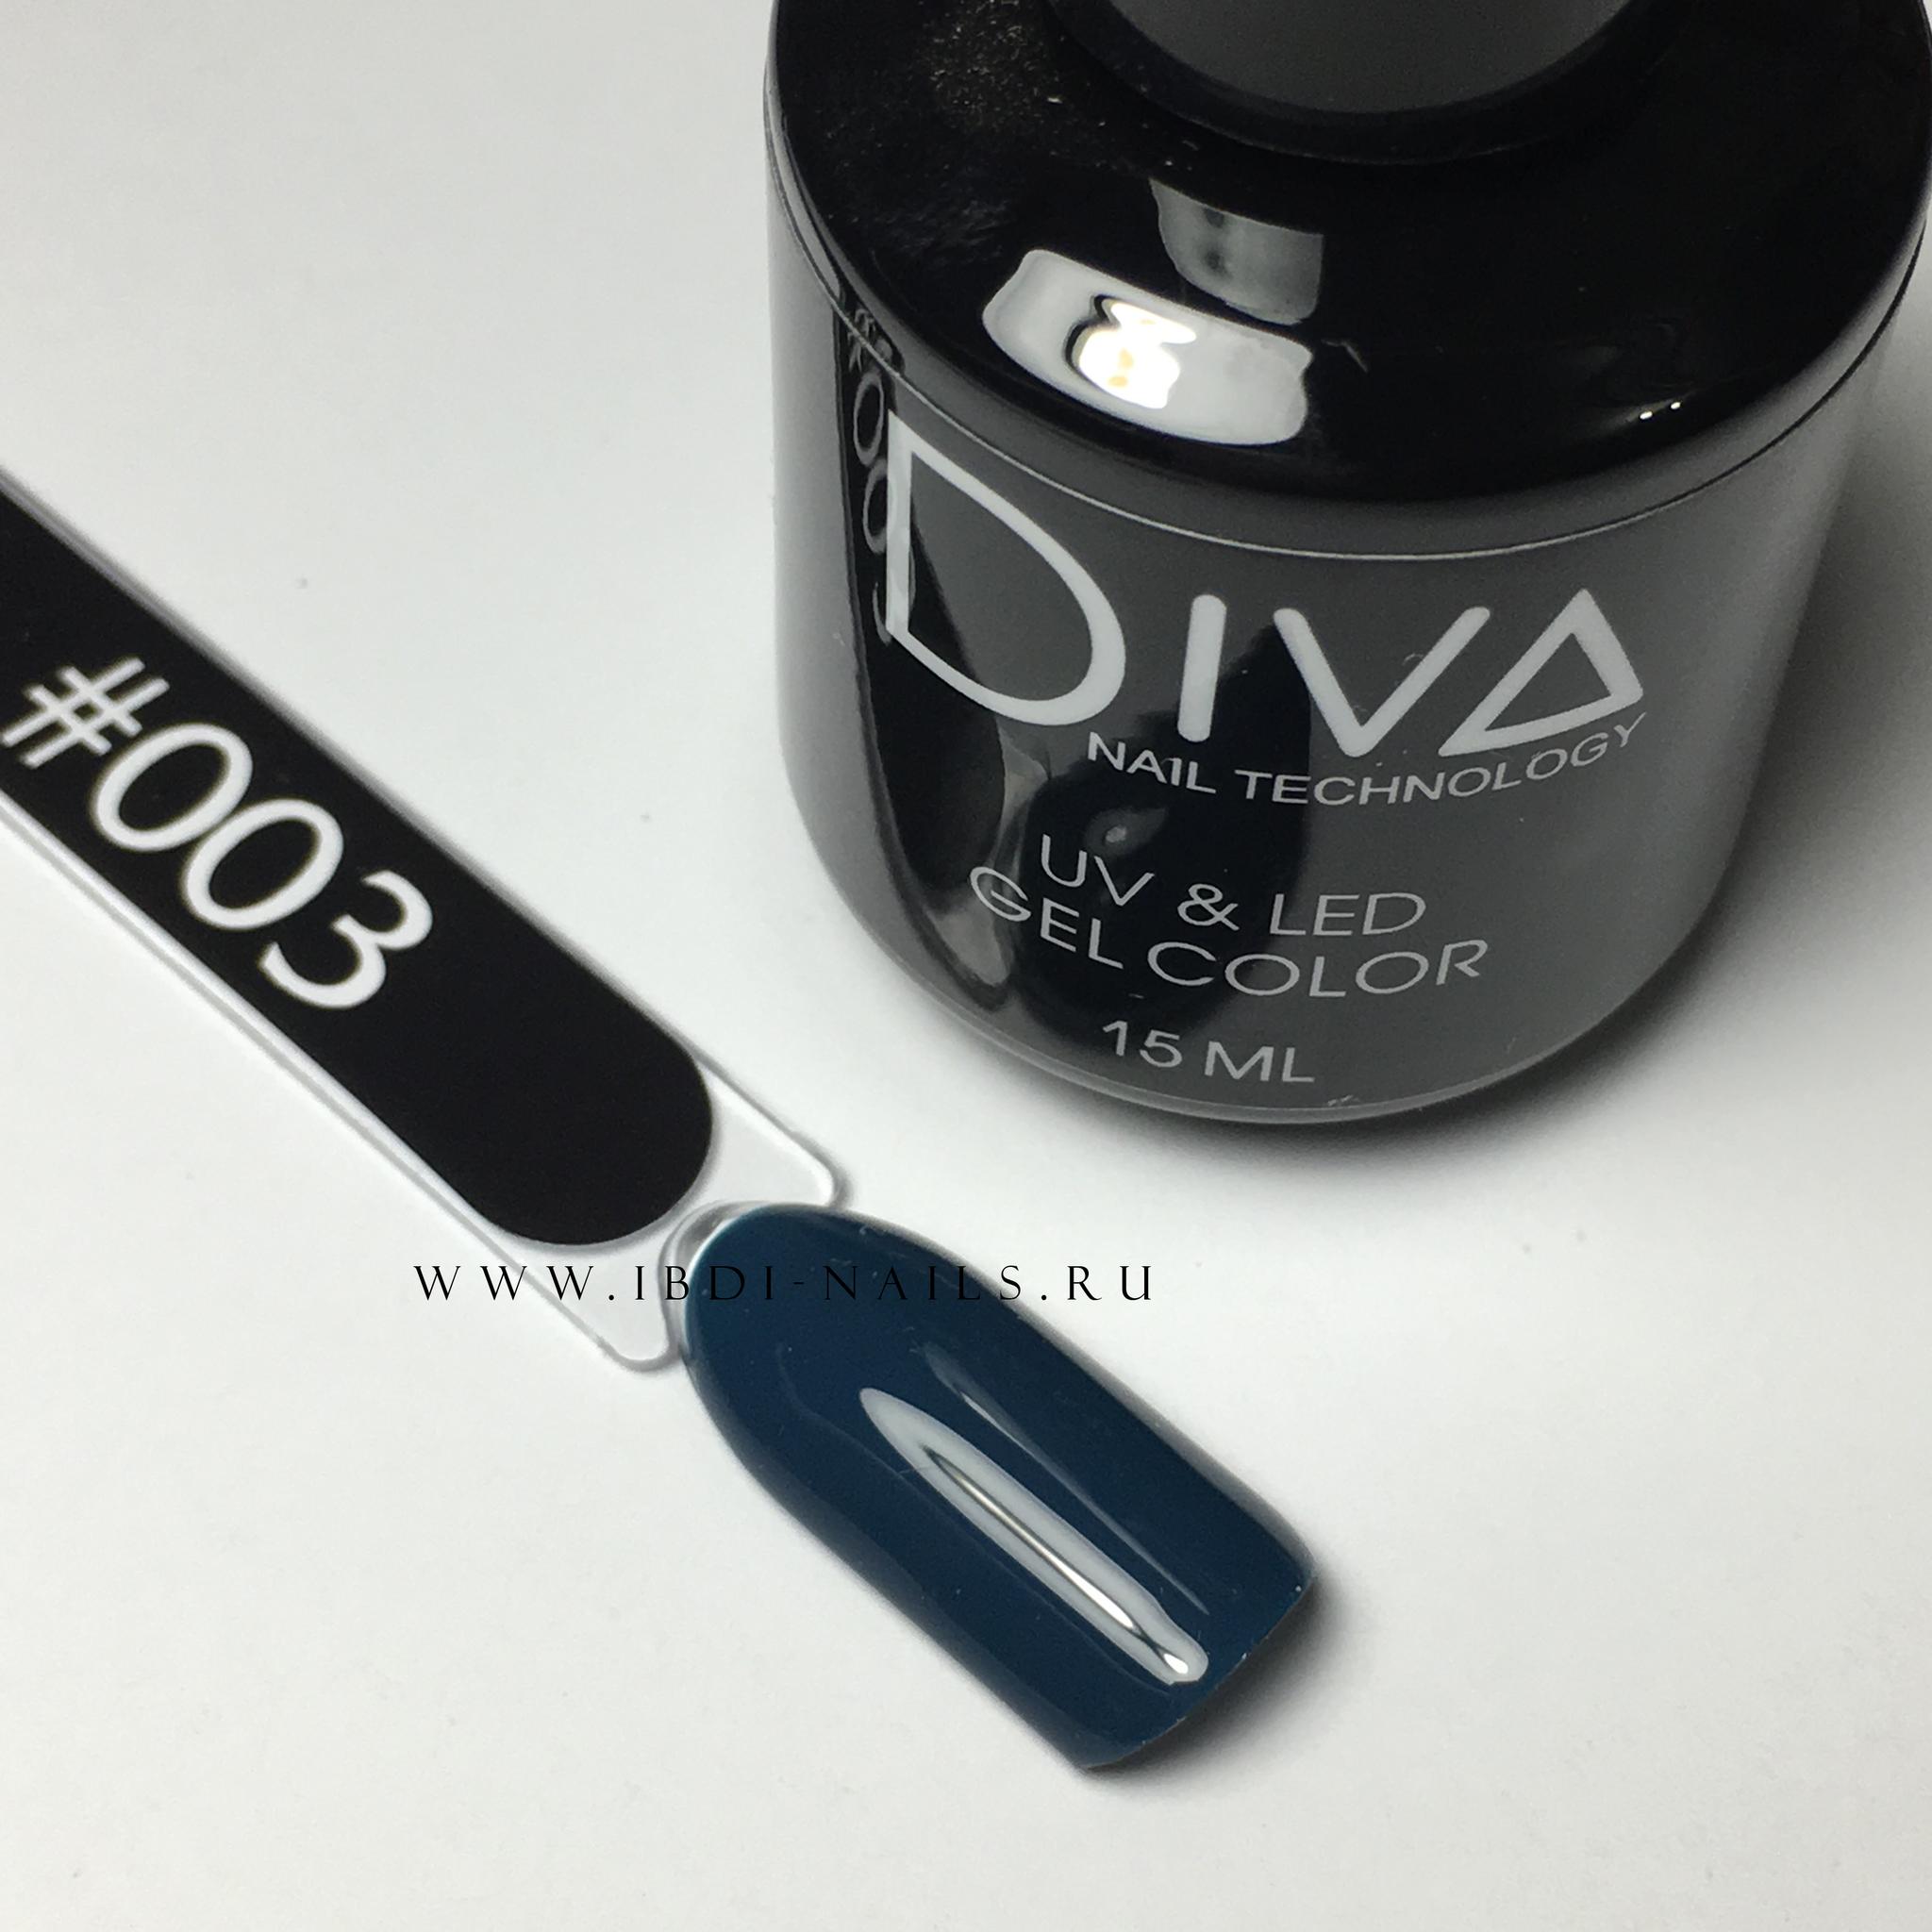 Гель-лак DIVA 003 15мл